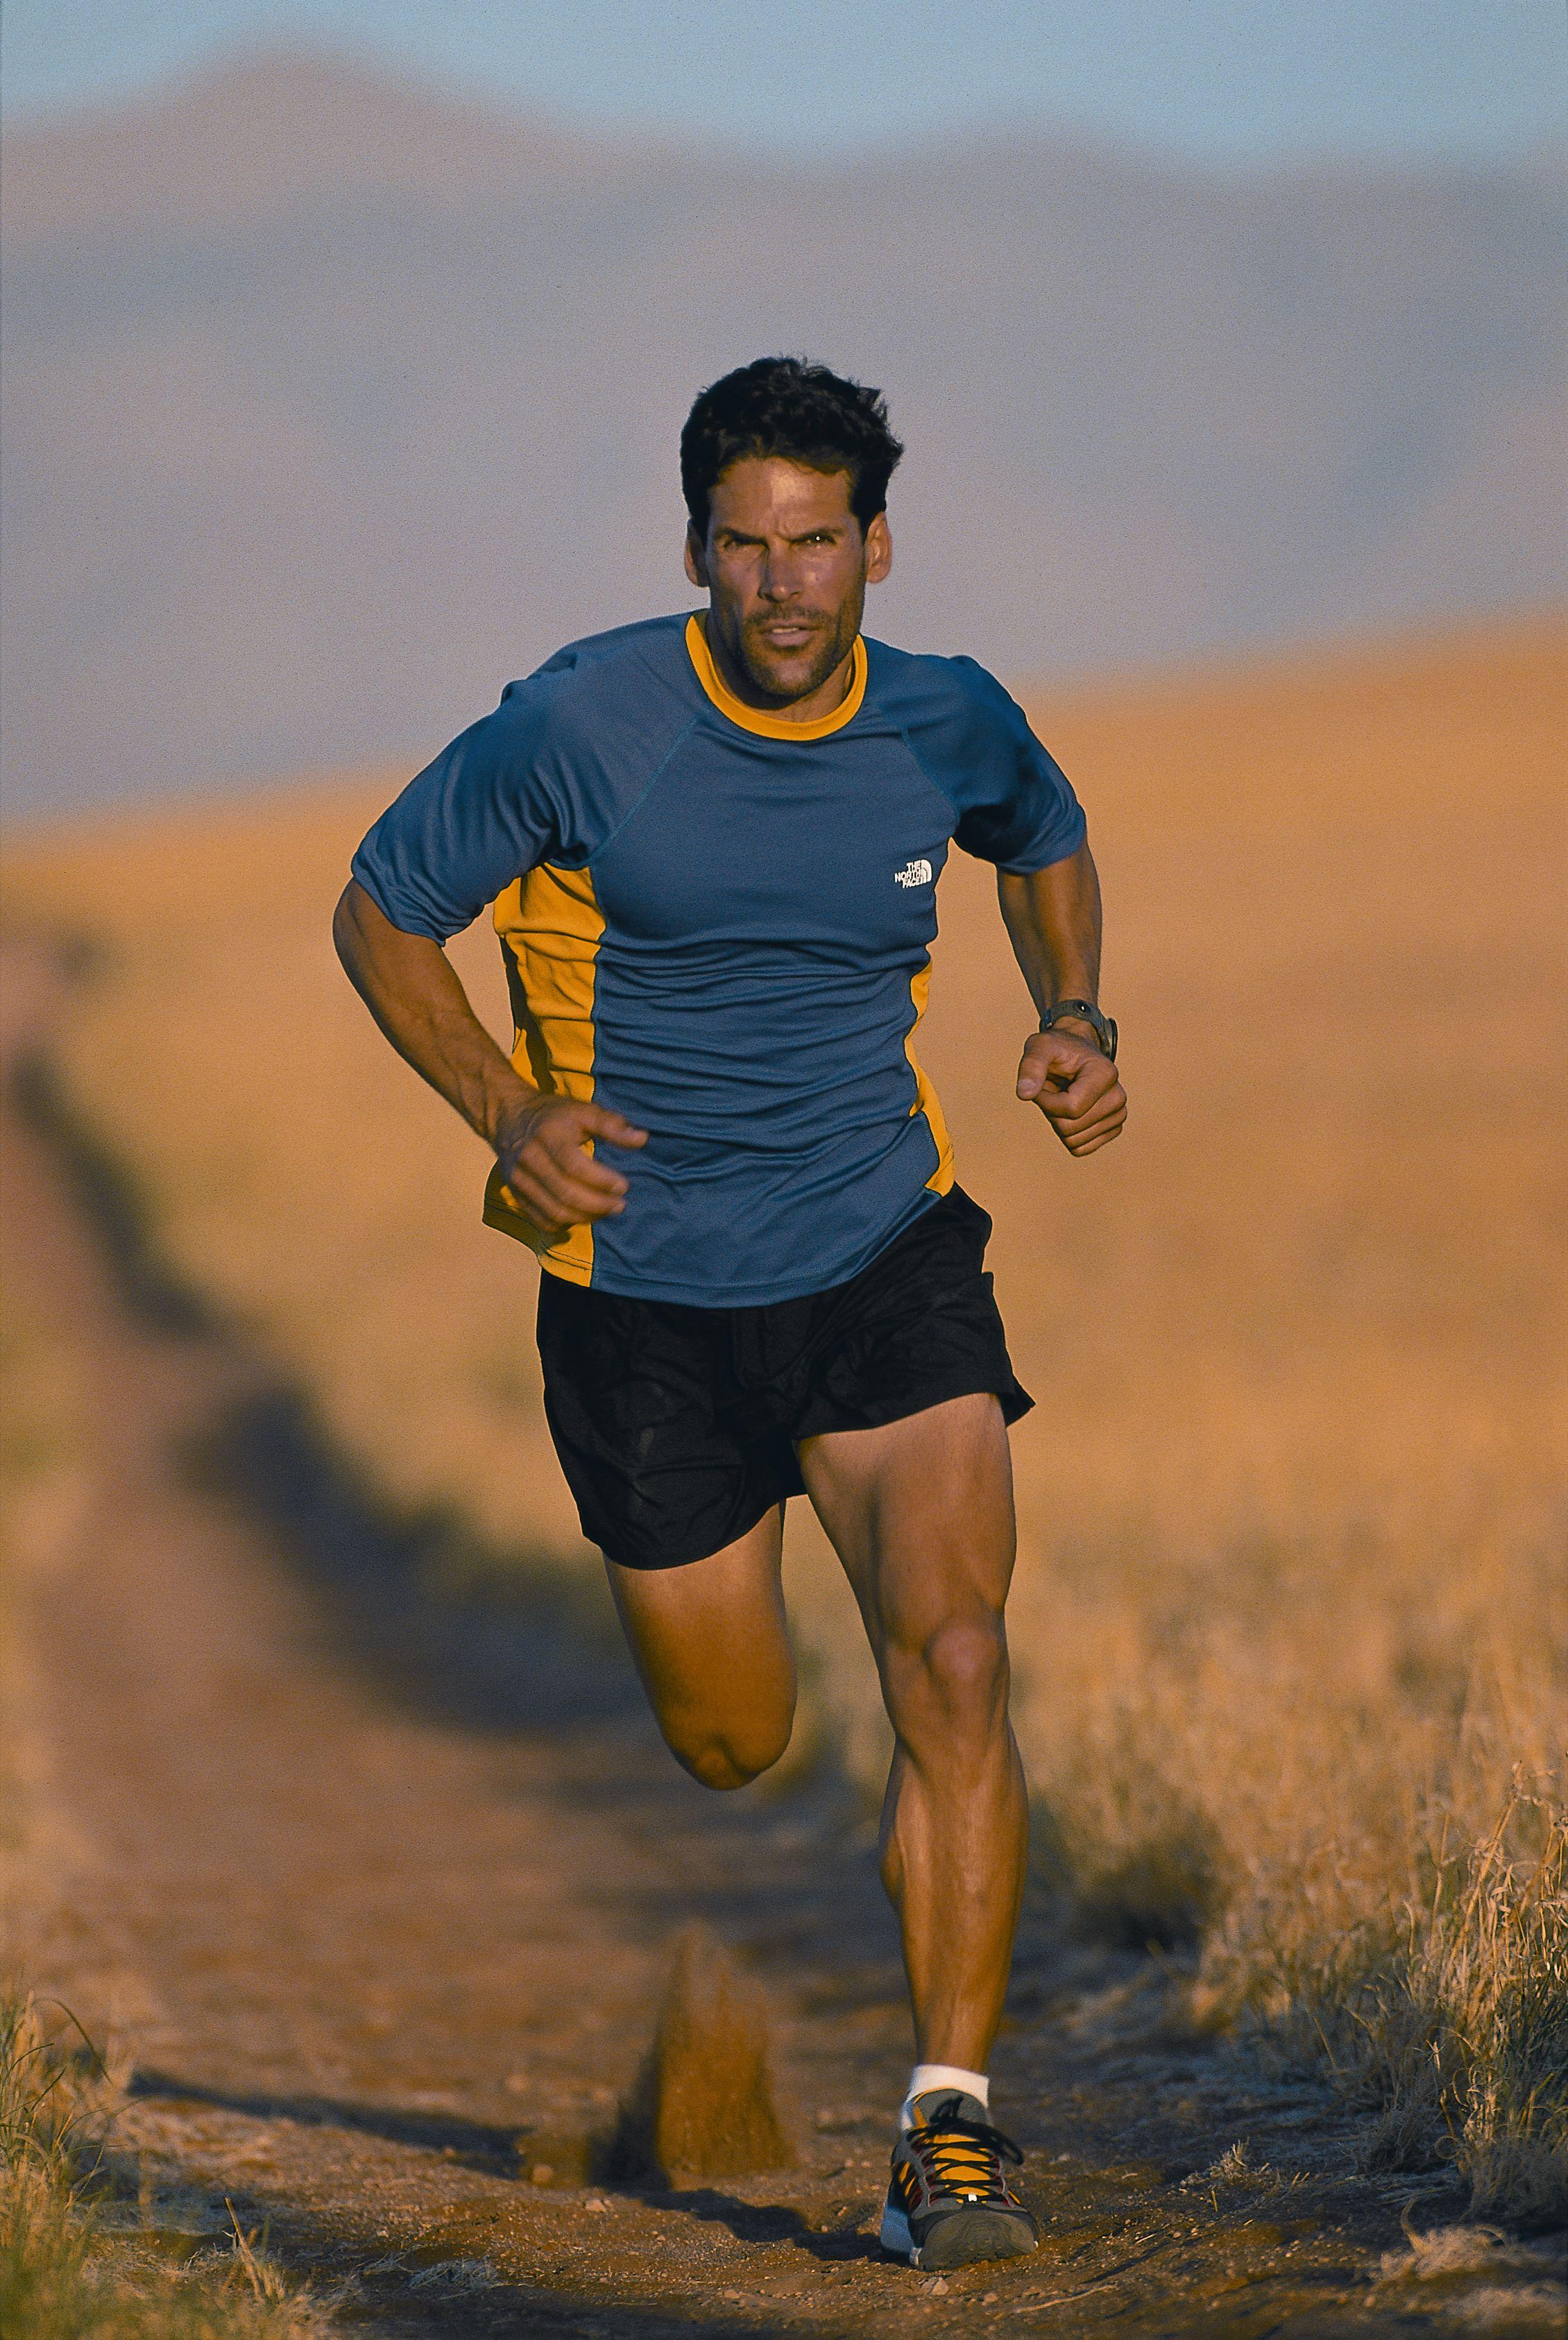 Ultramarathon News Podcasts: Ultra Marathon Man - Dean Karnazes